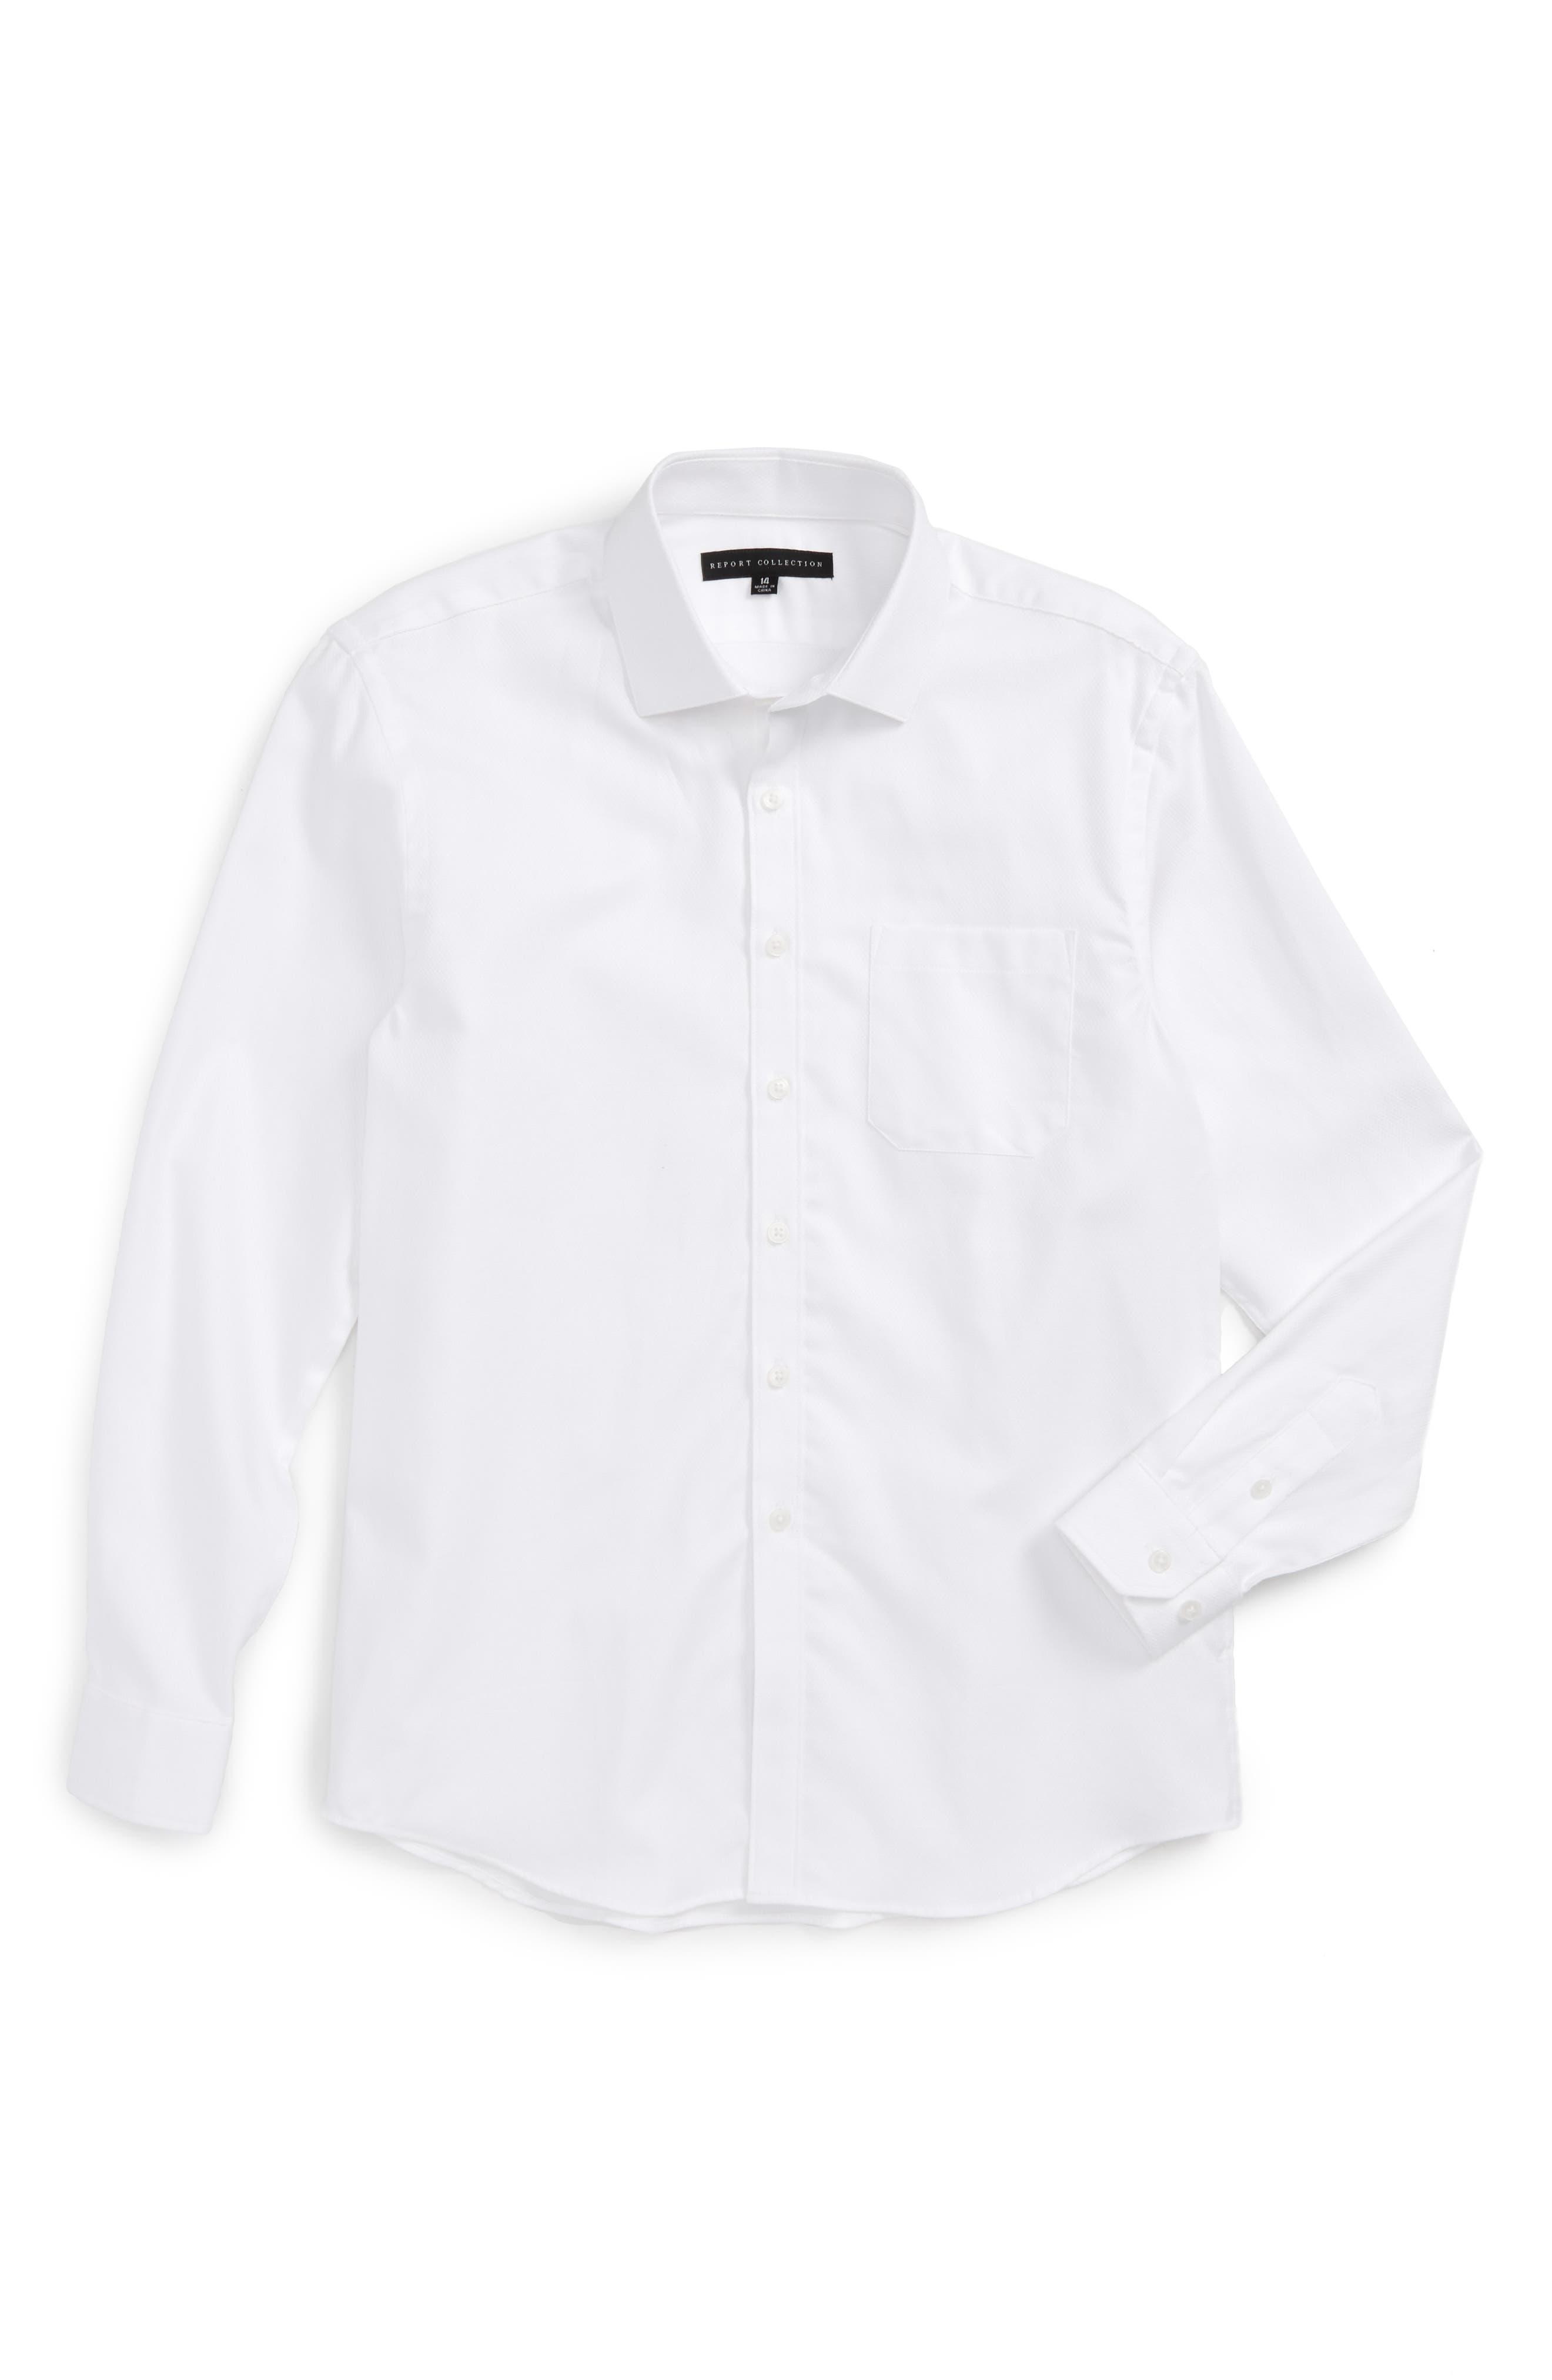 Textured Dress Shirt,                             Main thumbnail 1, color,                             101